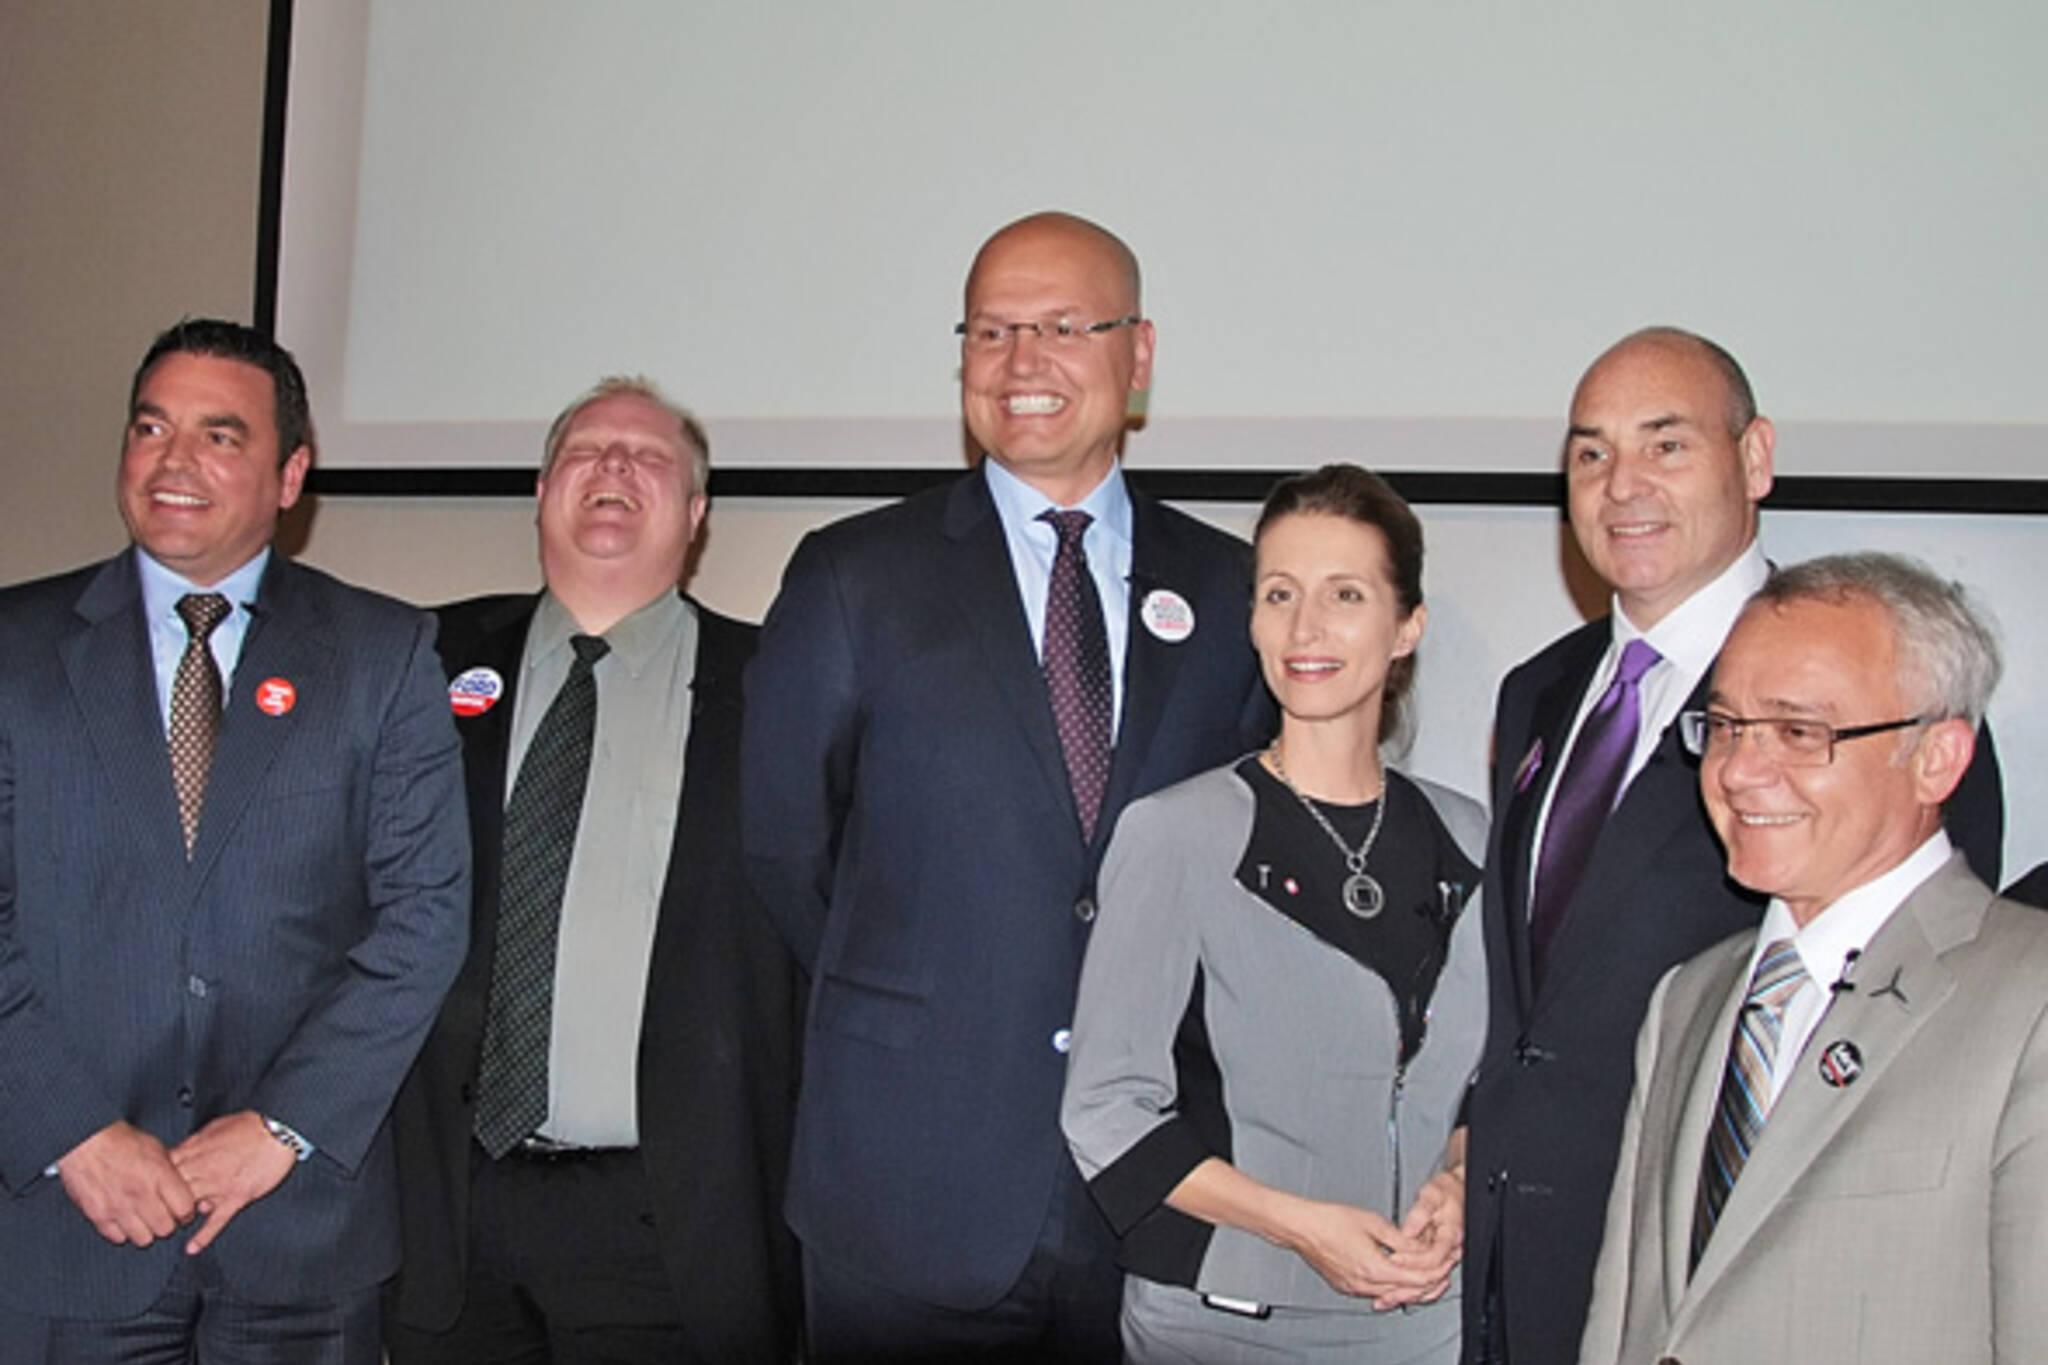 Toronto mayoral candidate